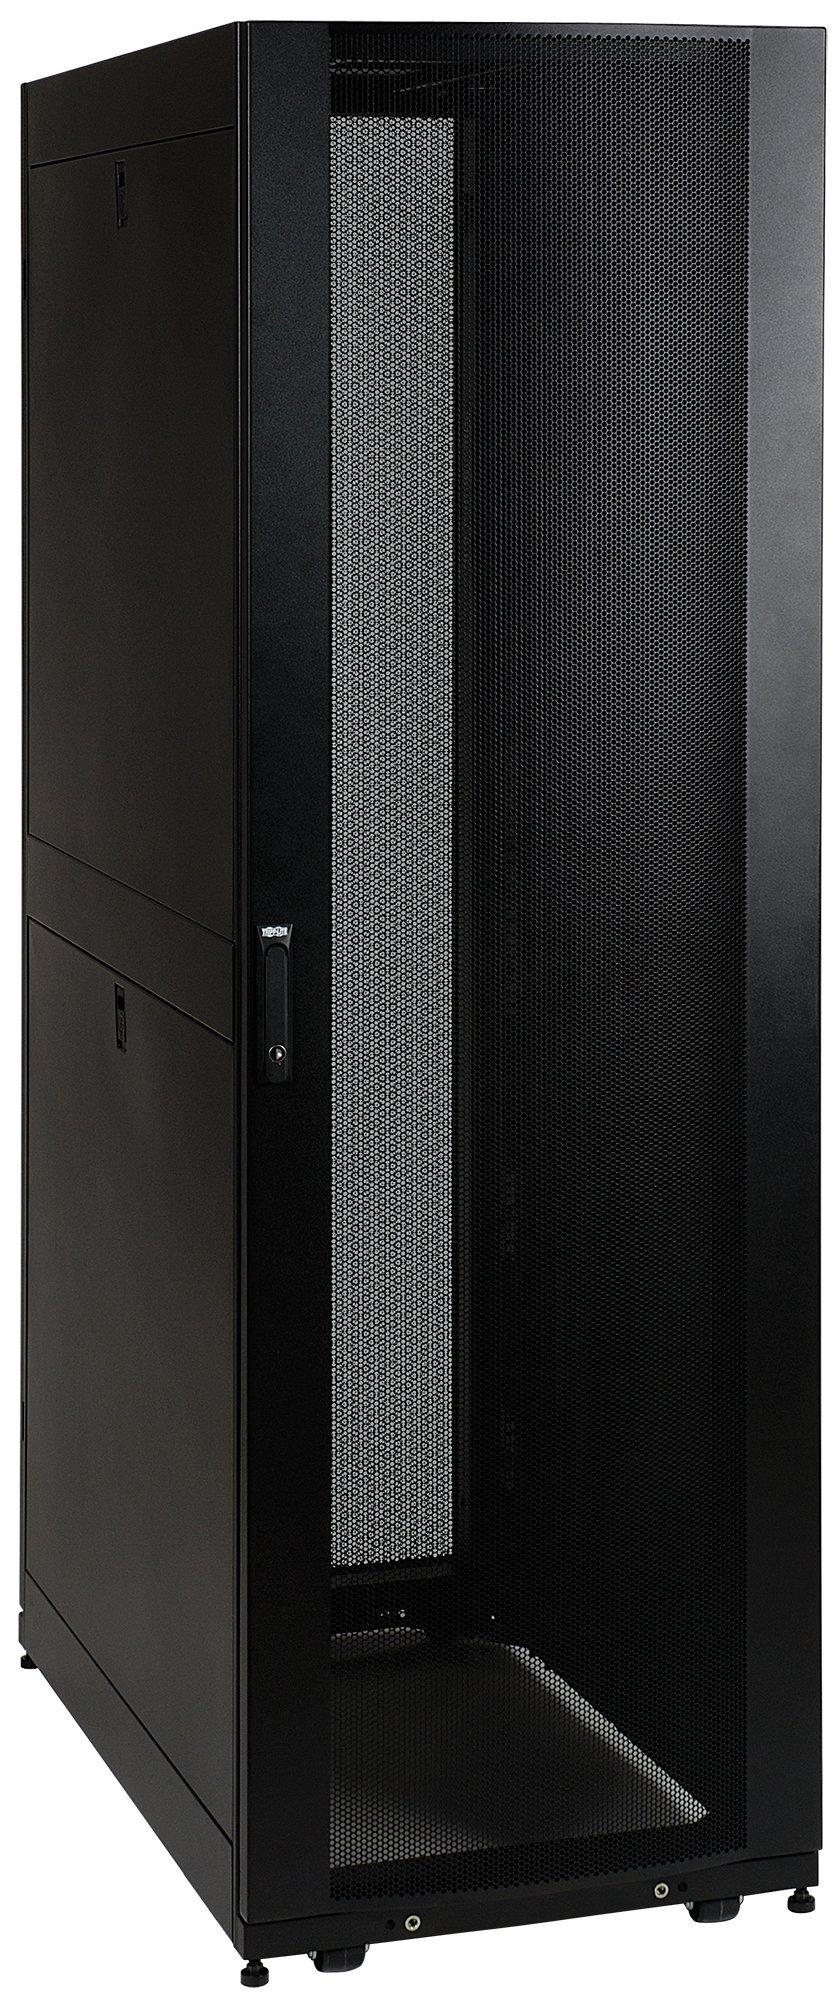 Tripp Lite SR48UB 48U Rack Enclosure Server Cabinet Doors and Sides 3000lb Capacity